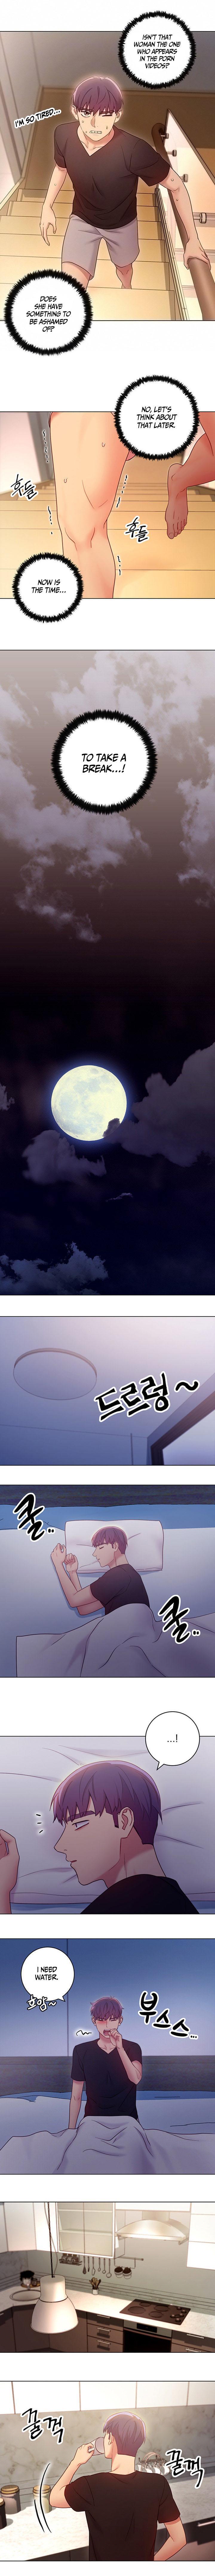 [Neck Pilllow] Stepmother Friends Ch.39/? [English] [Hentai Universe] NEW! 13/10/2020 302